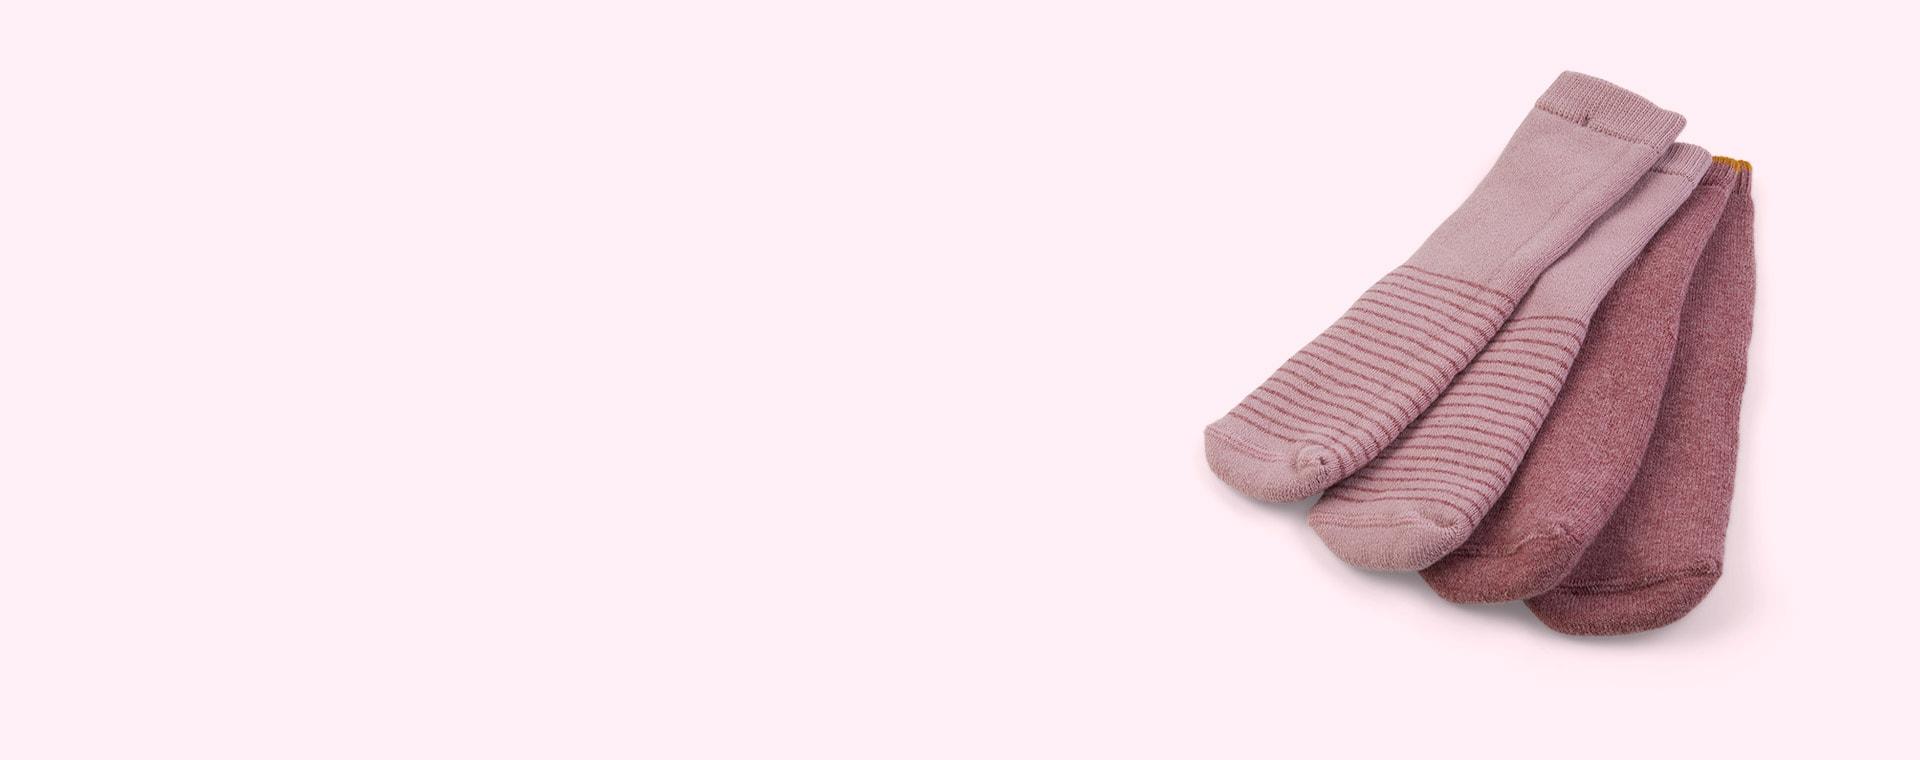 Rosewood Lassig 2-Pack Anti-Slip Socks